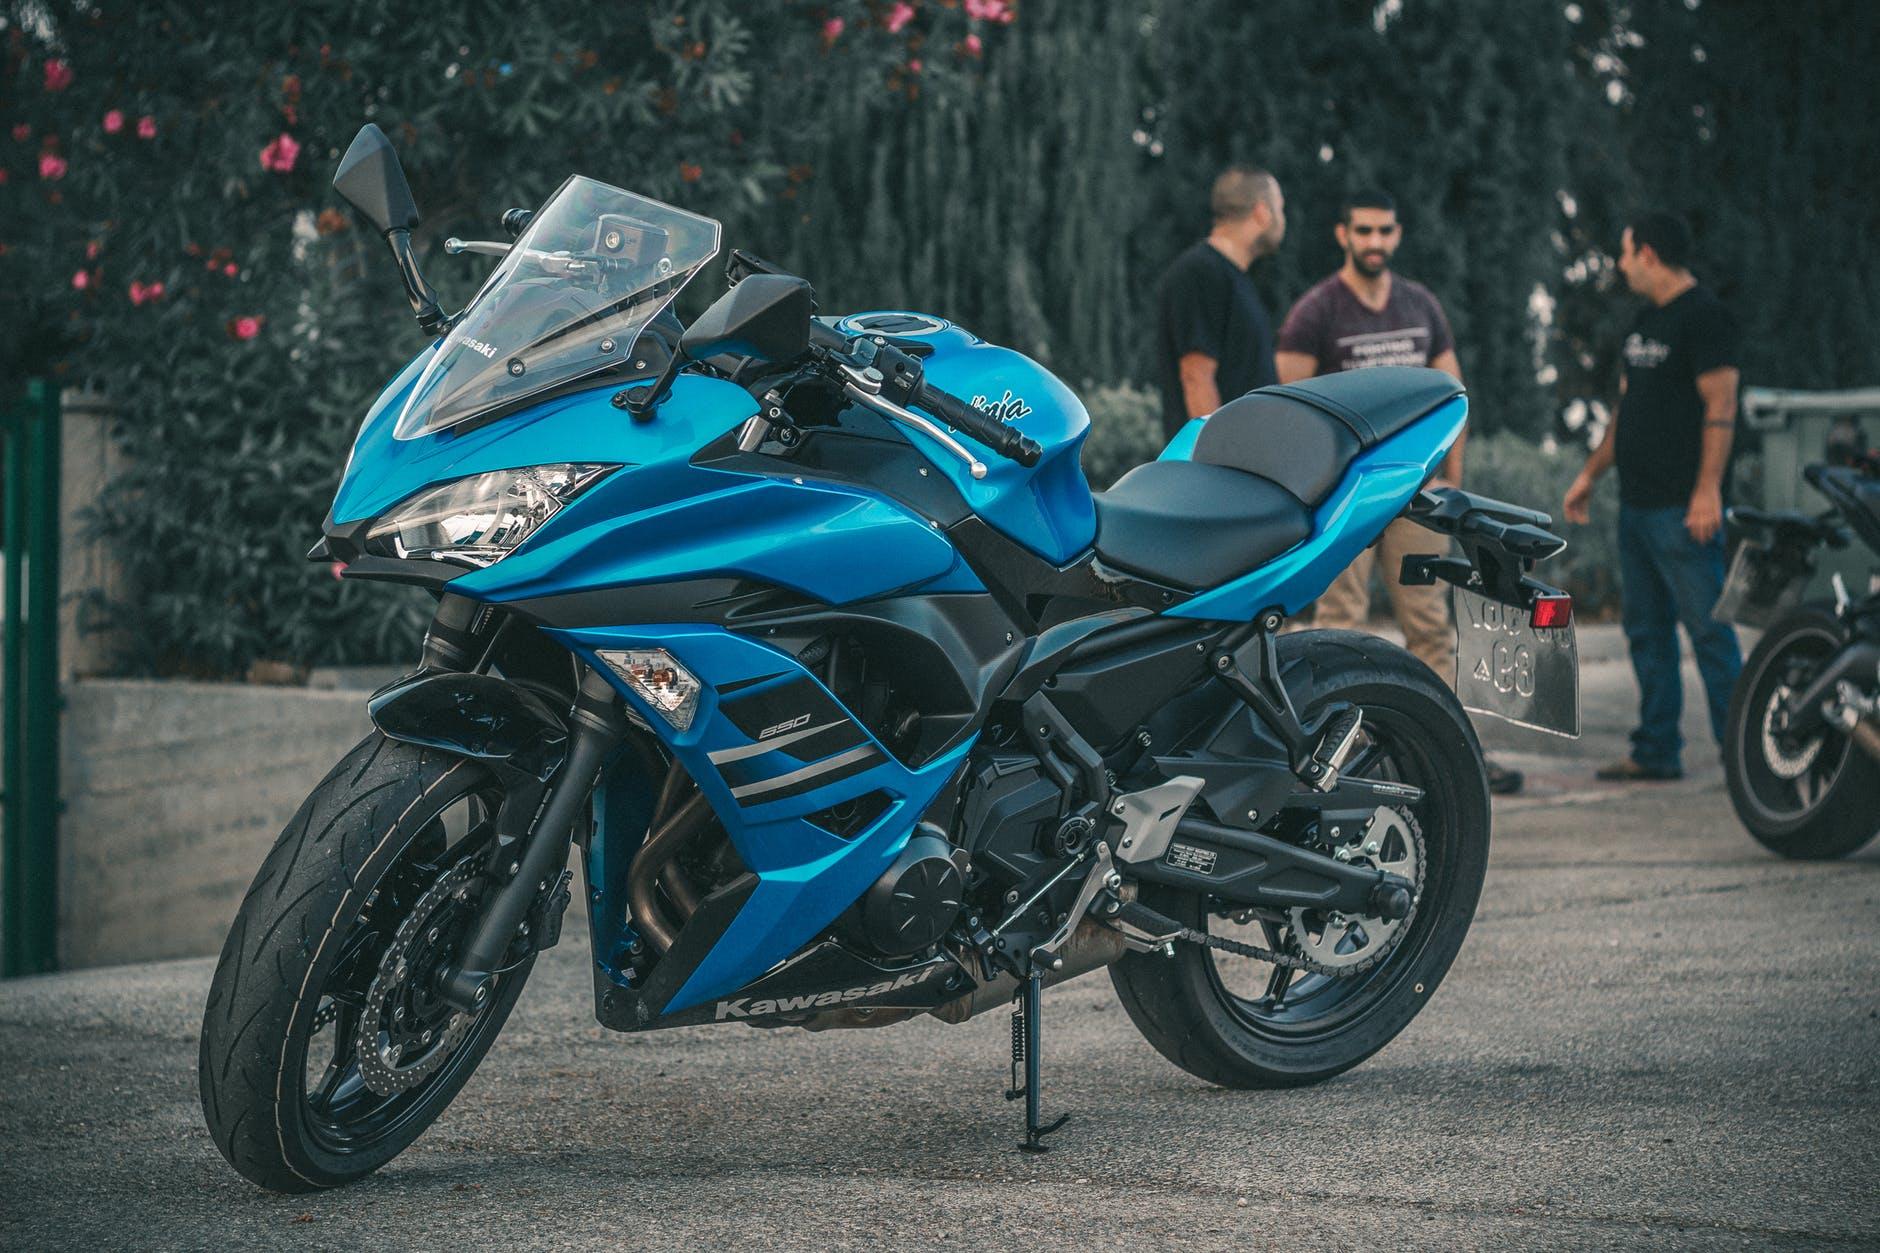 Kawasaki motorverzekering